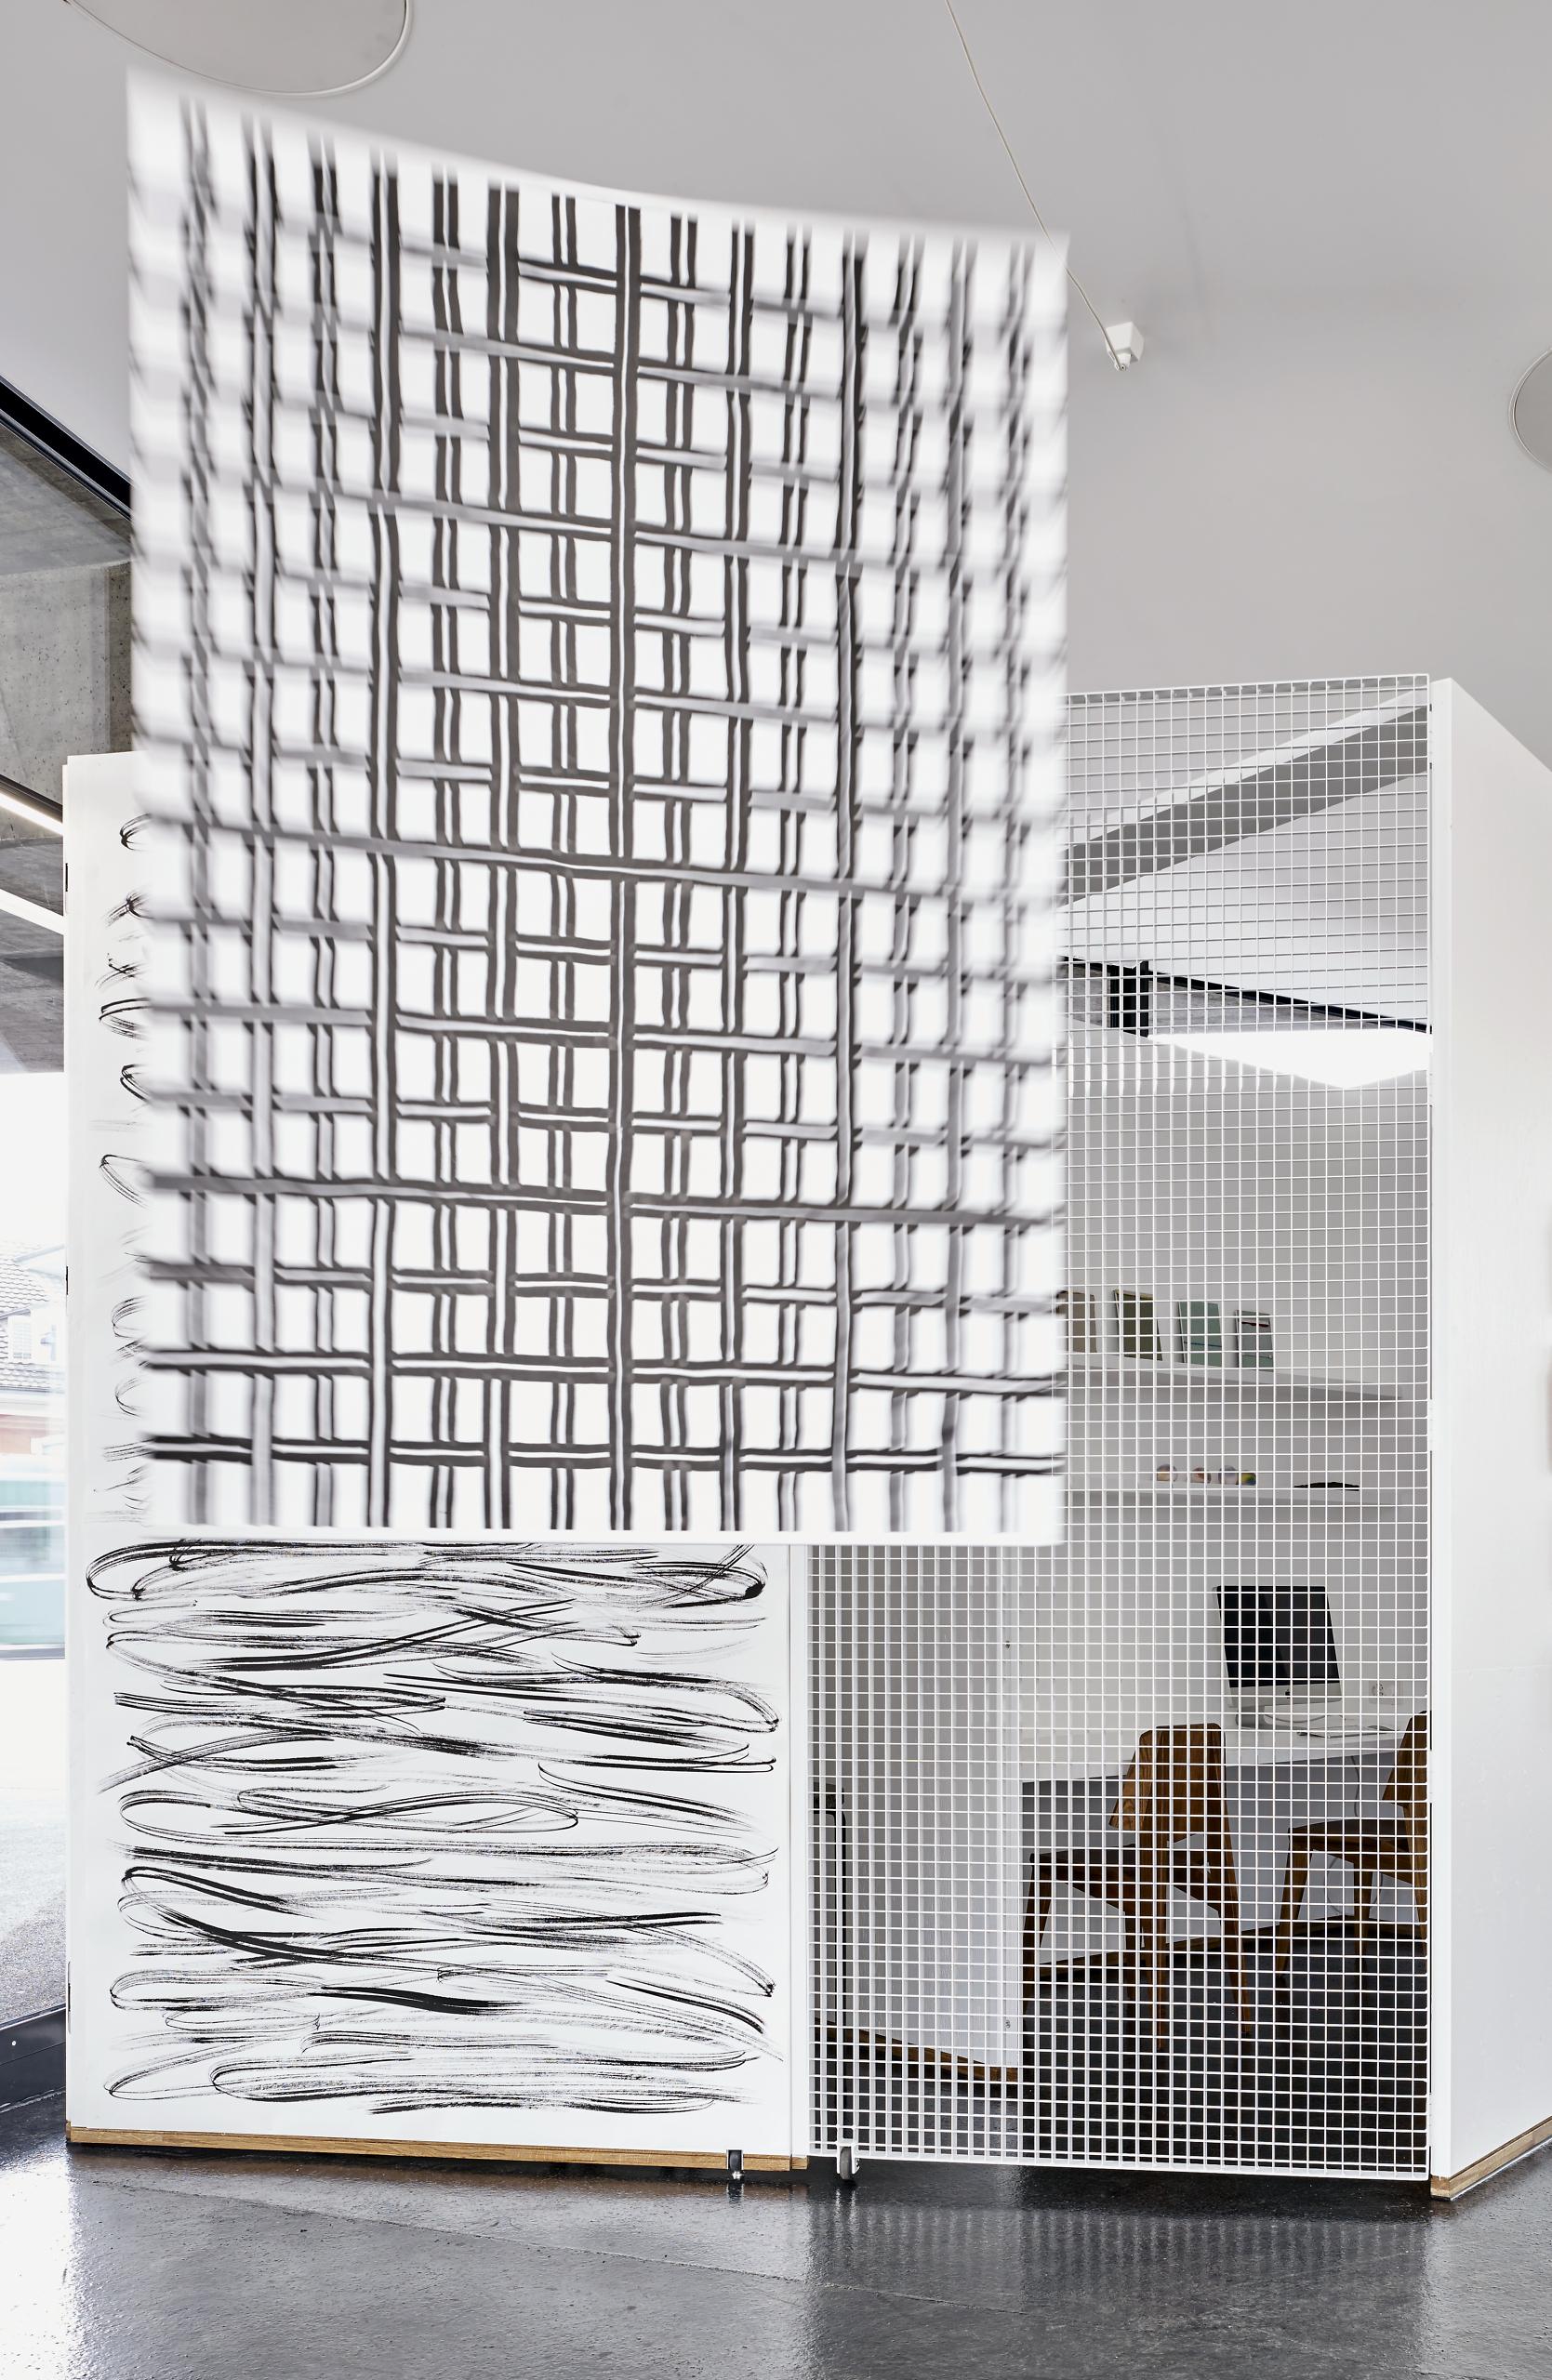 Sam Porritt, Both Vice and Versa, 2016. Installation view. VITRINE, Basel. Photographer: Mark Niedermann.